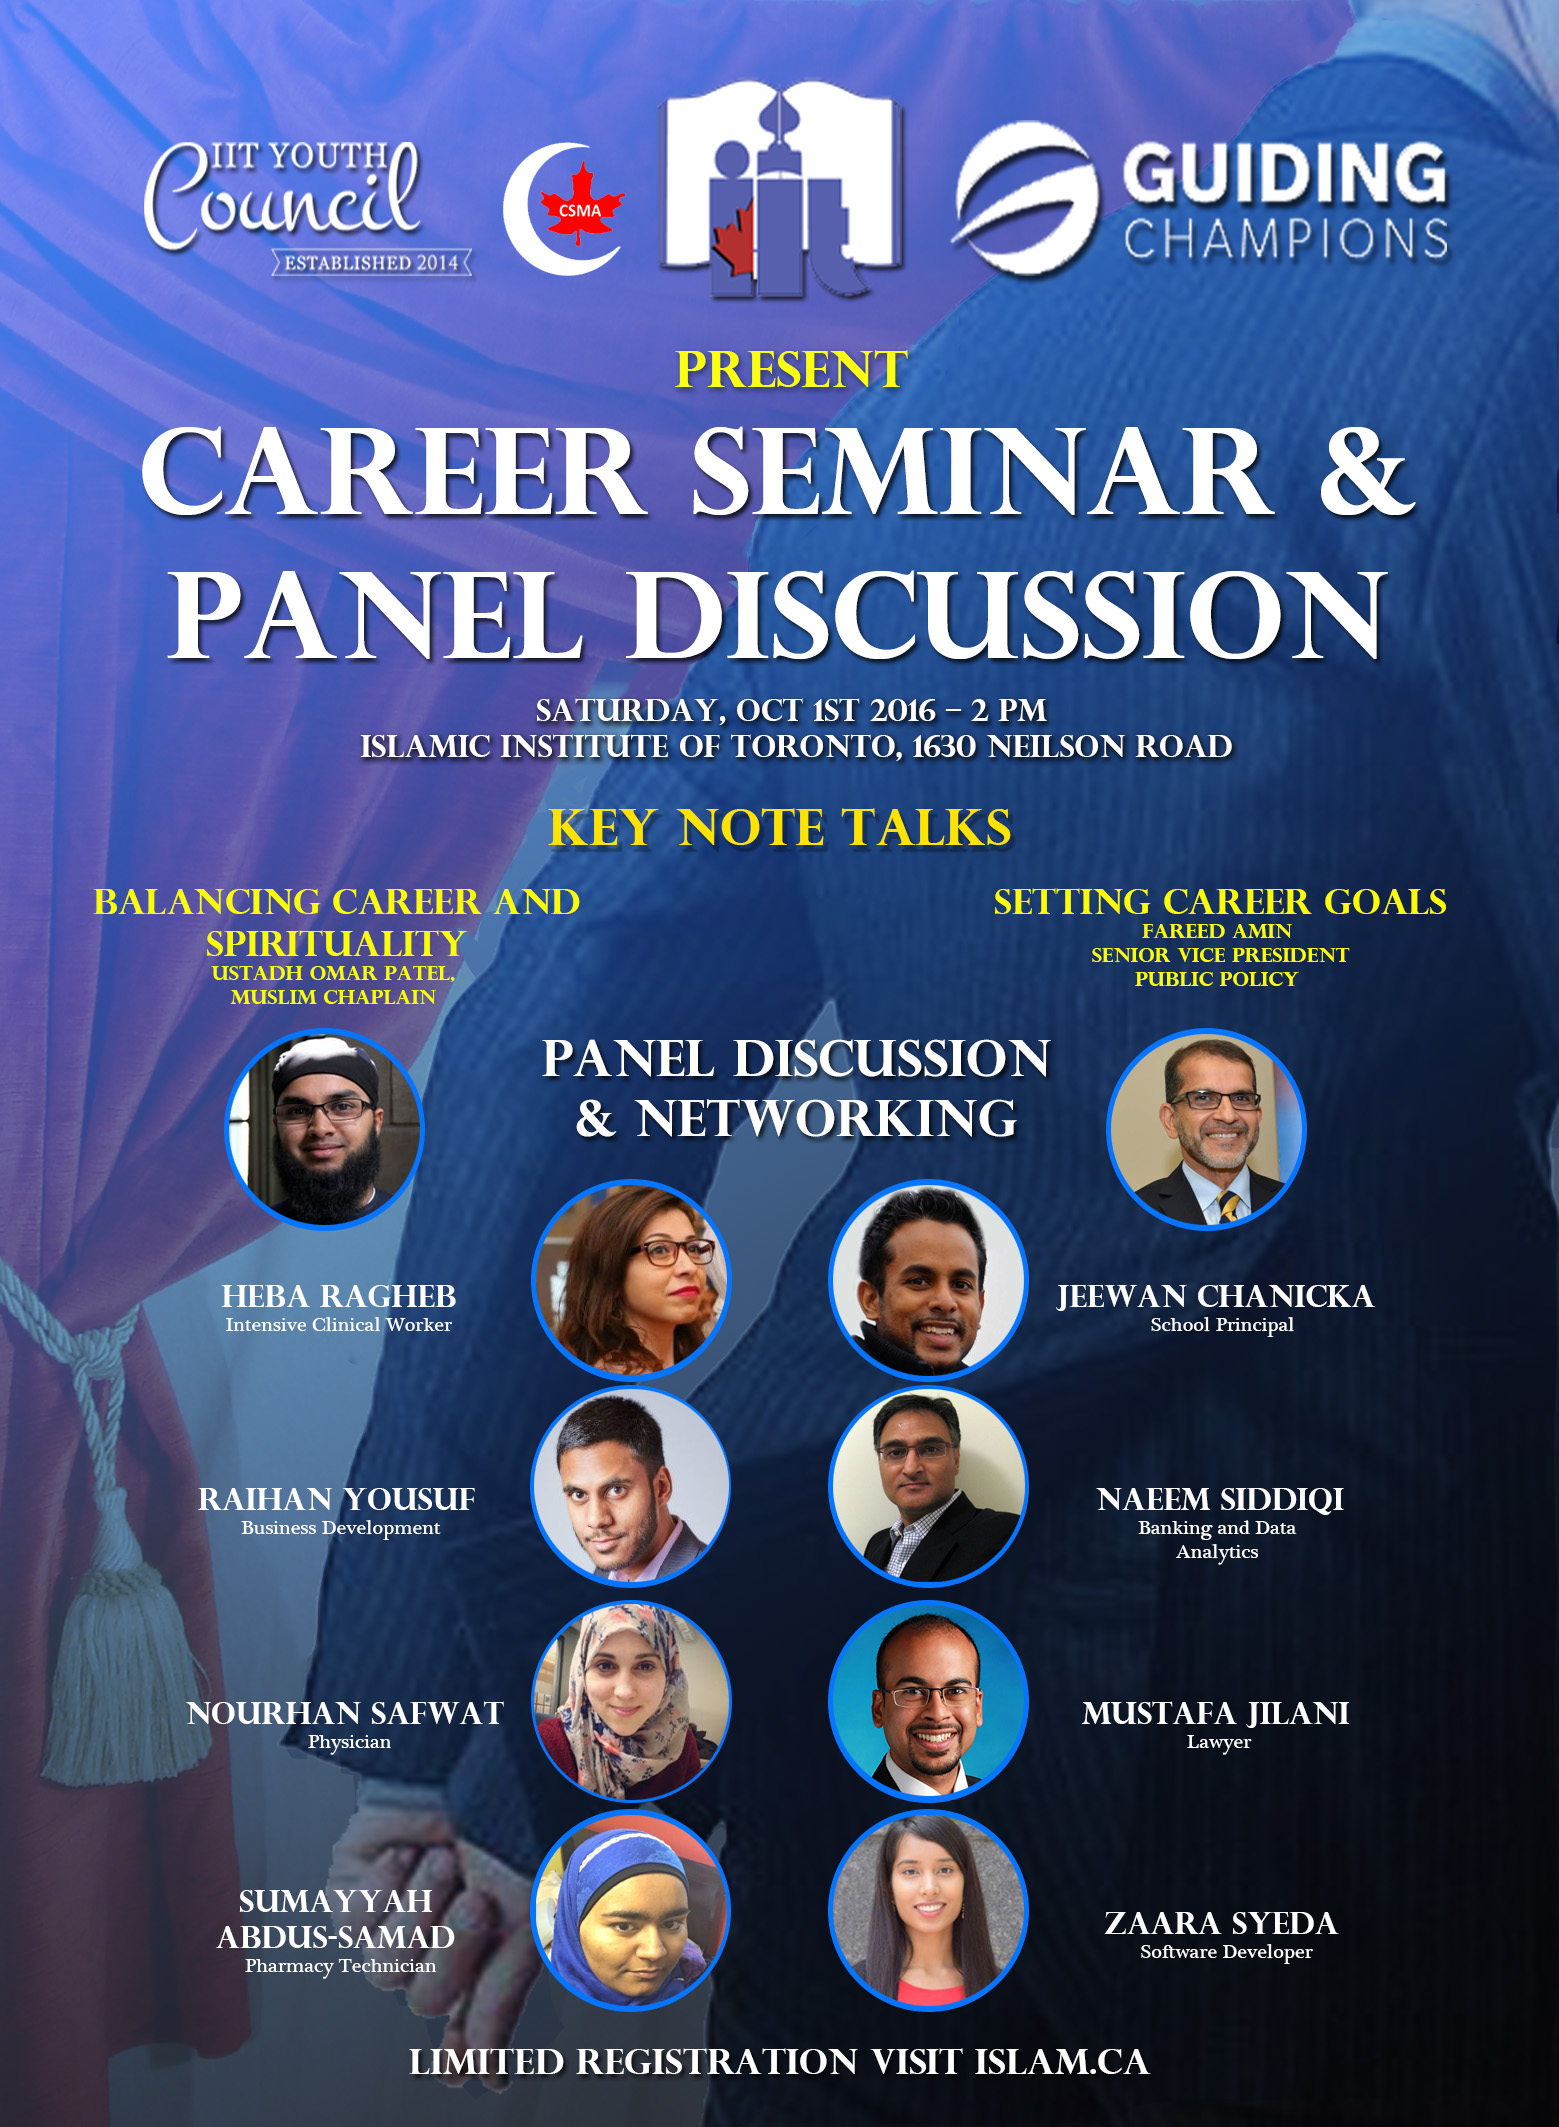 Career Seminar & Panel Discussion 2016